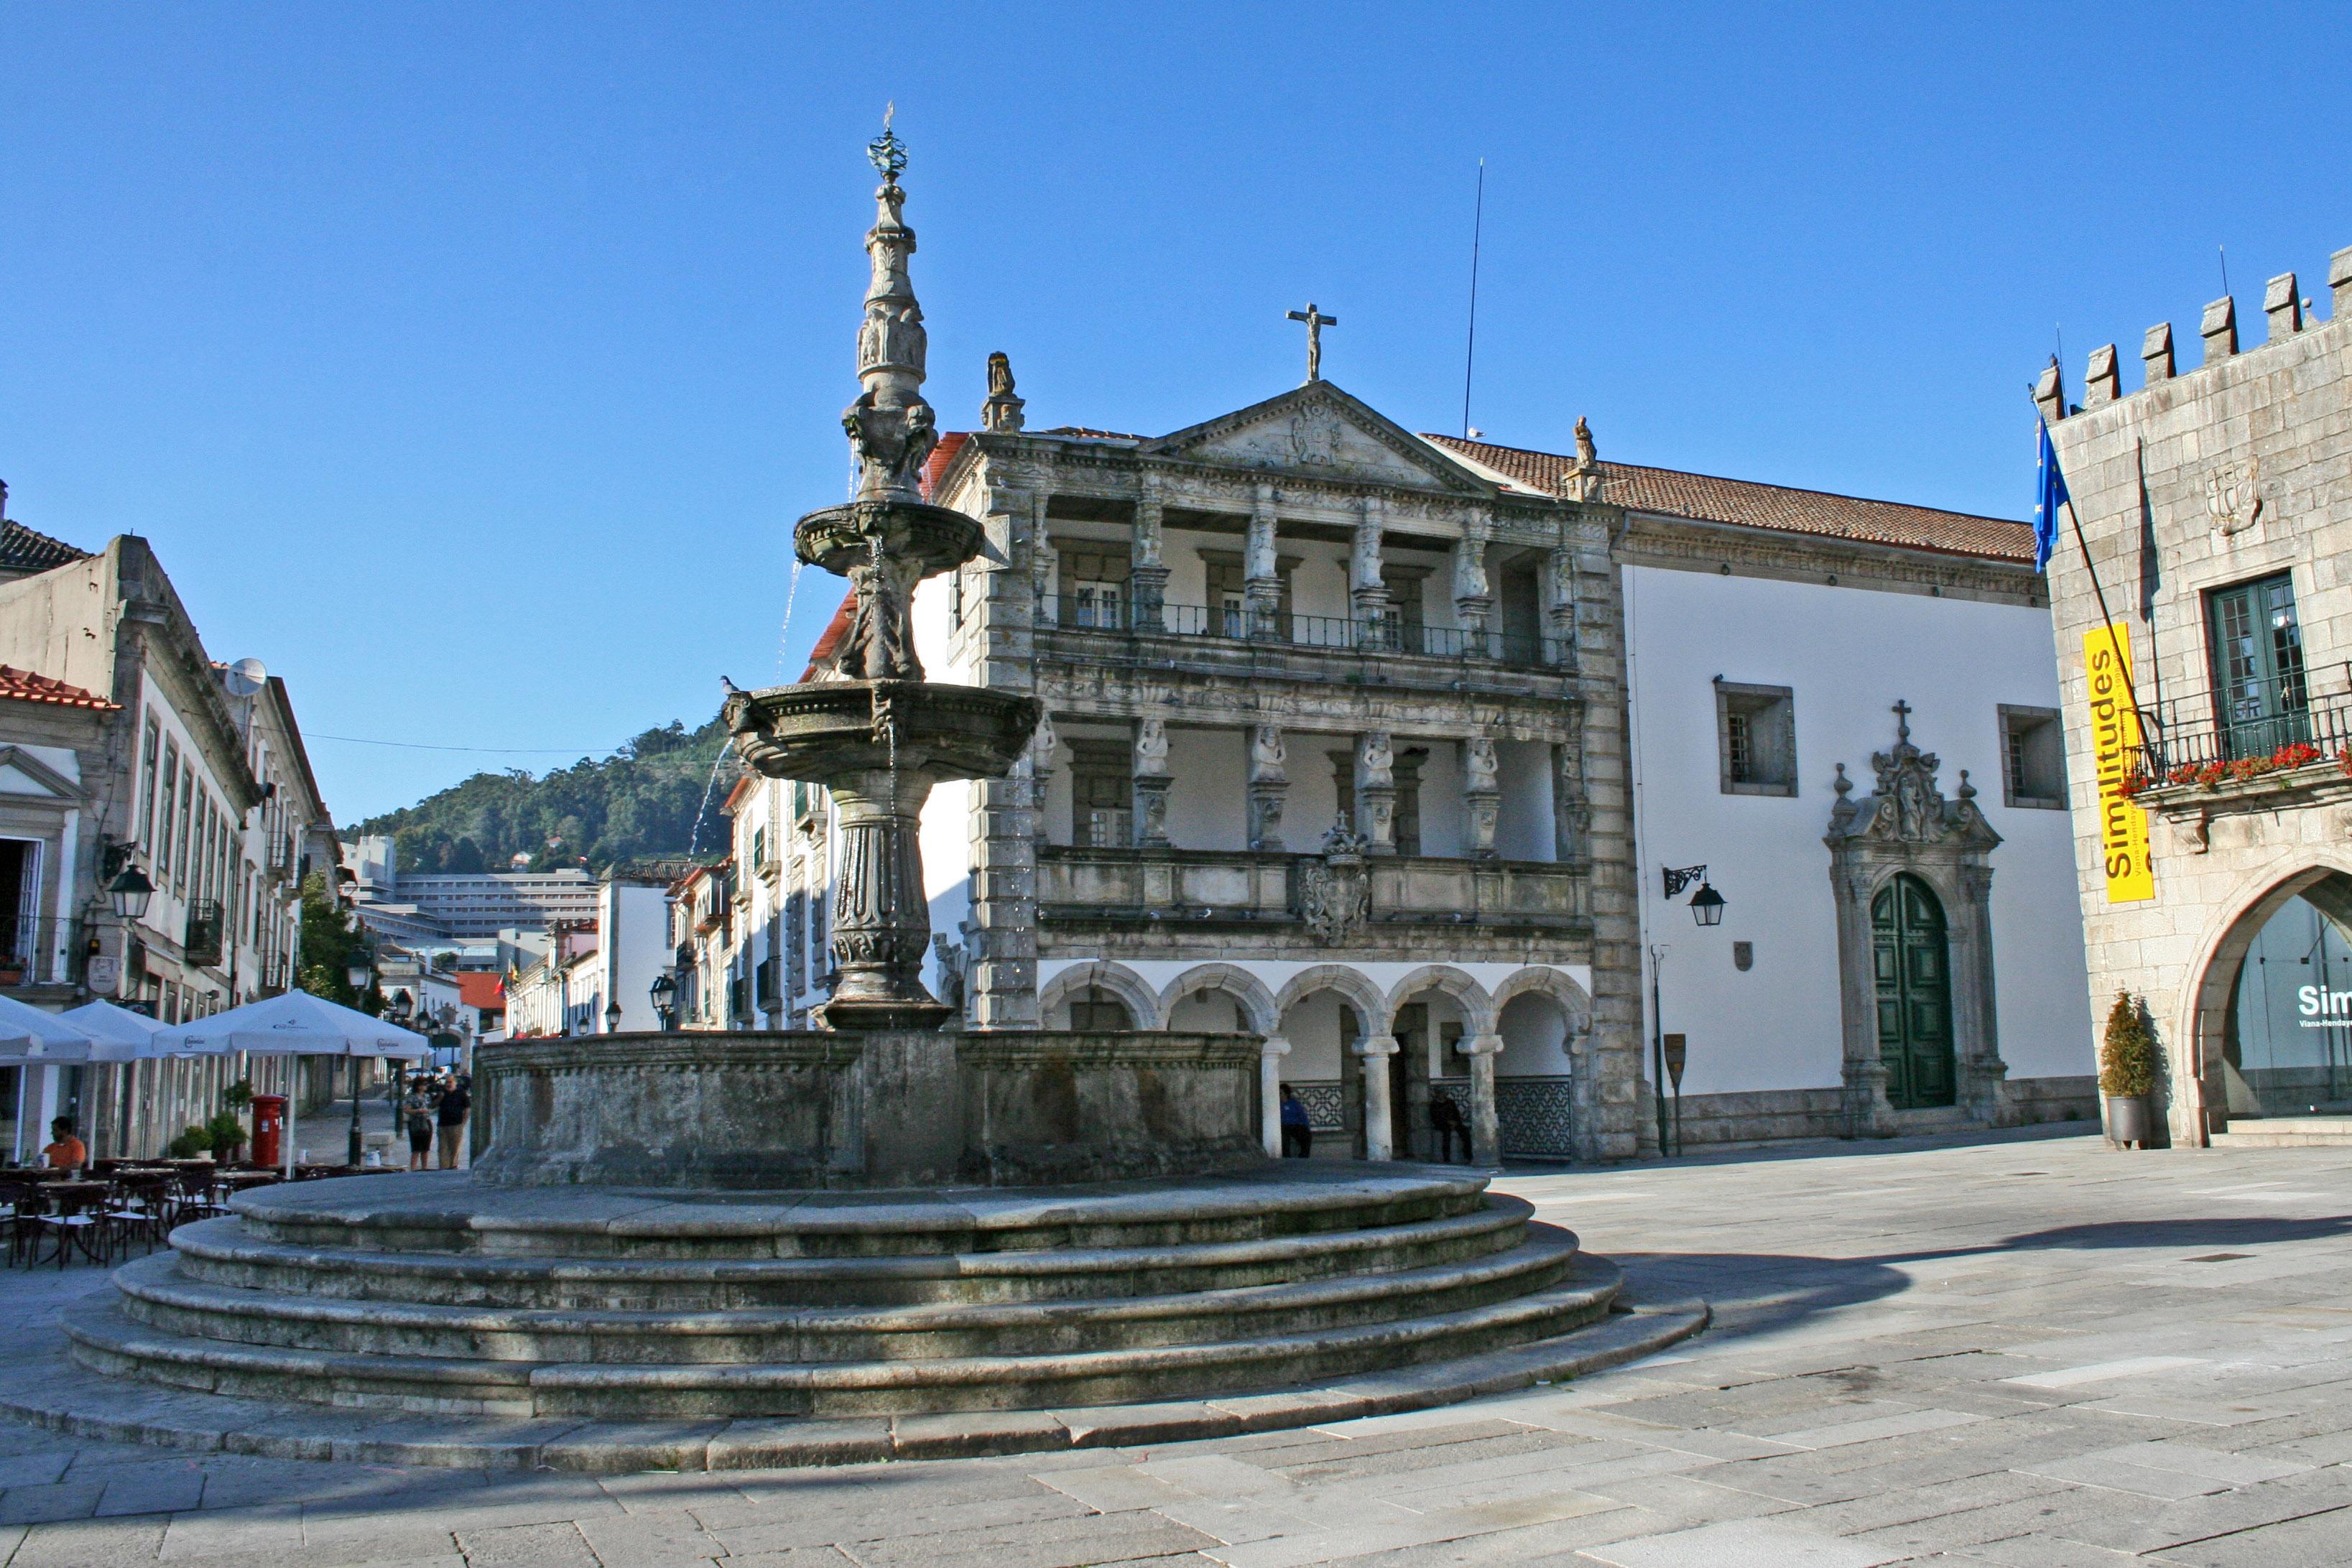 Http Commons Wikimedia Org Wiki File Chafariz E Miseric C3 B3rdia De Viana Do Castelo Jpg